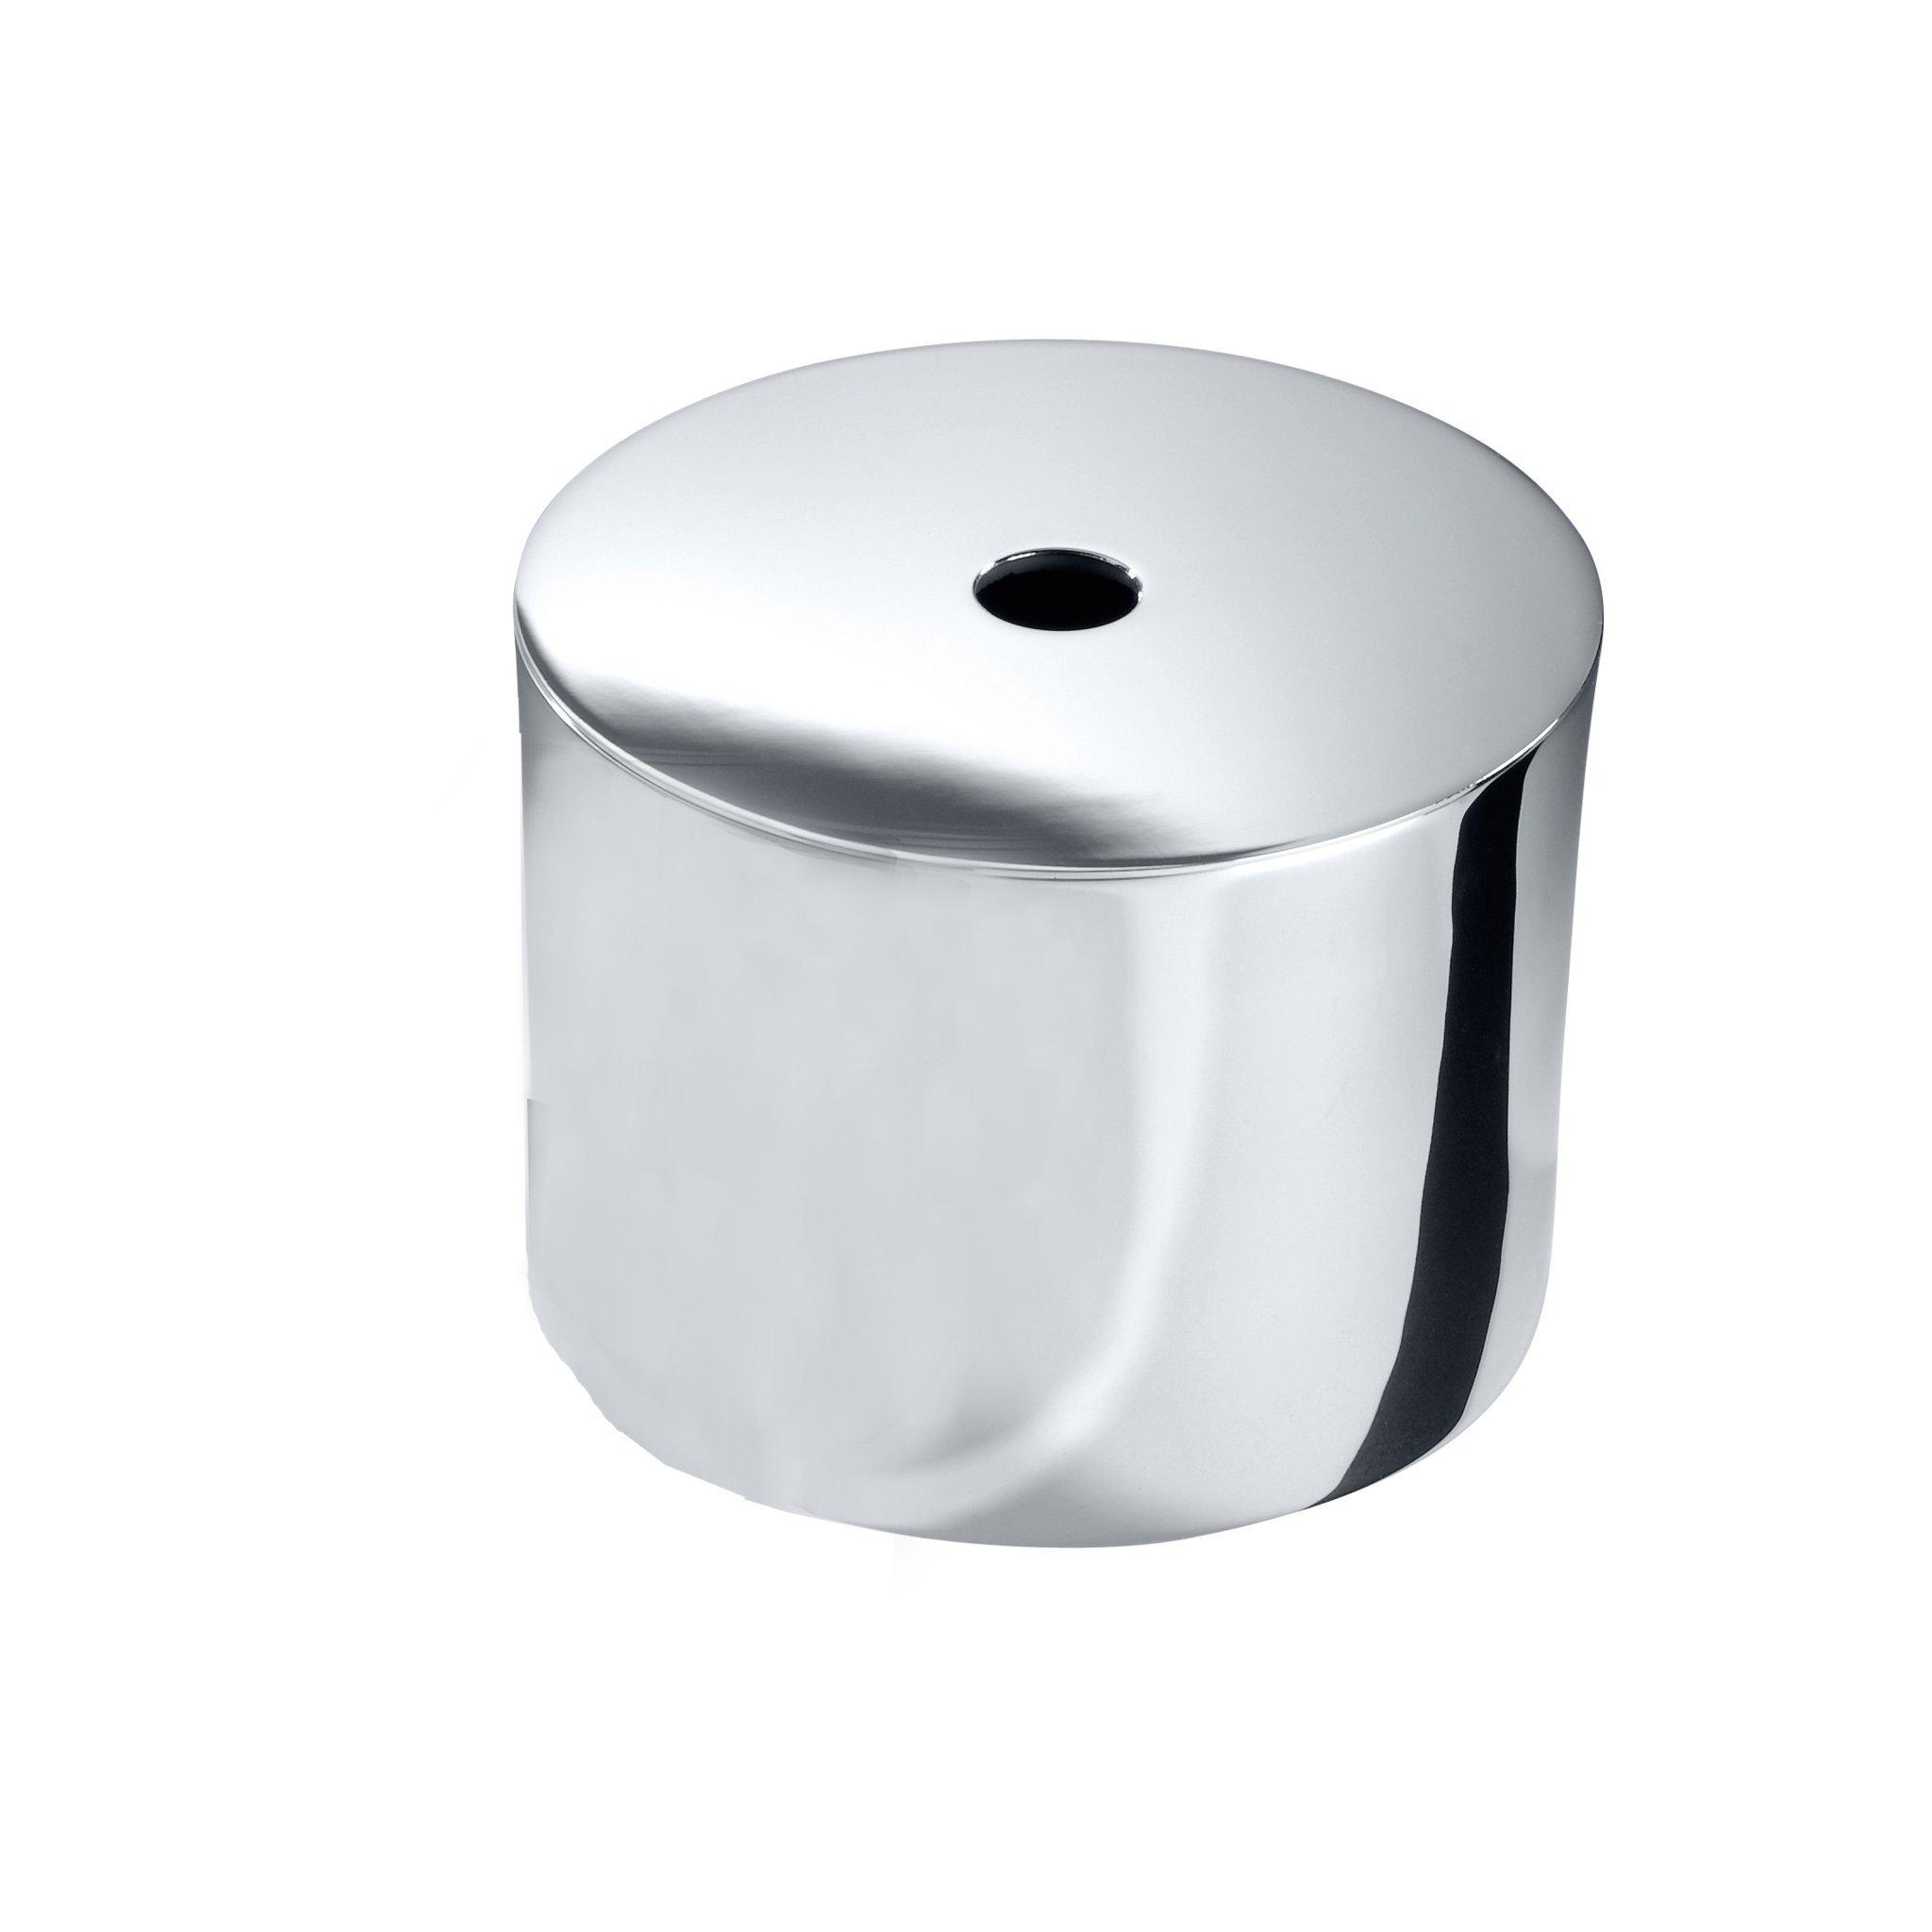 DWBA Round Brass Tissue Box Holder Cover Tray Dispenser Tissue Case for Bath (Polished Chrome)